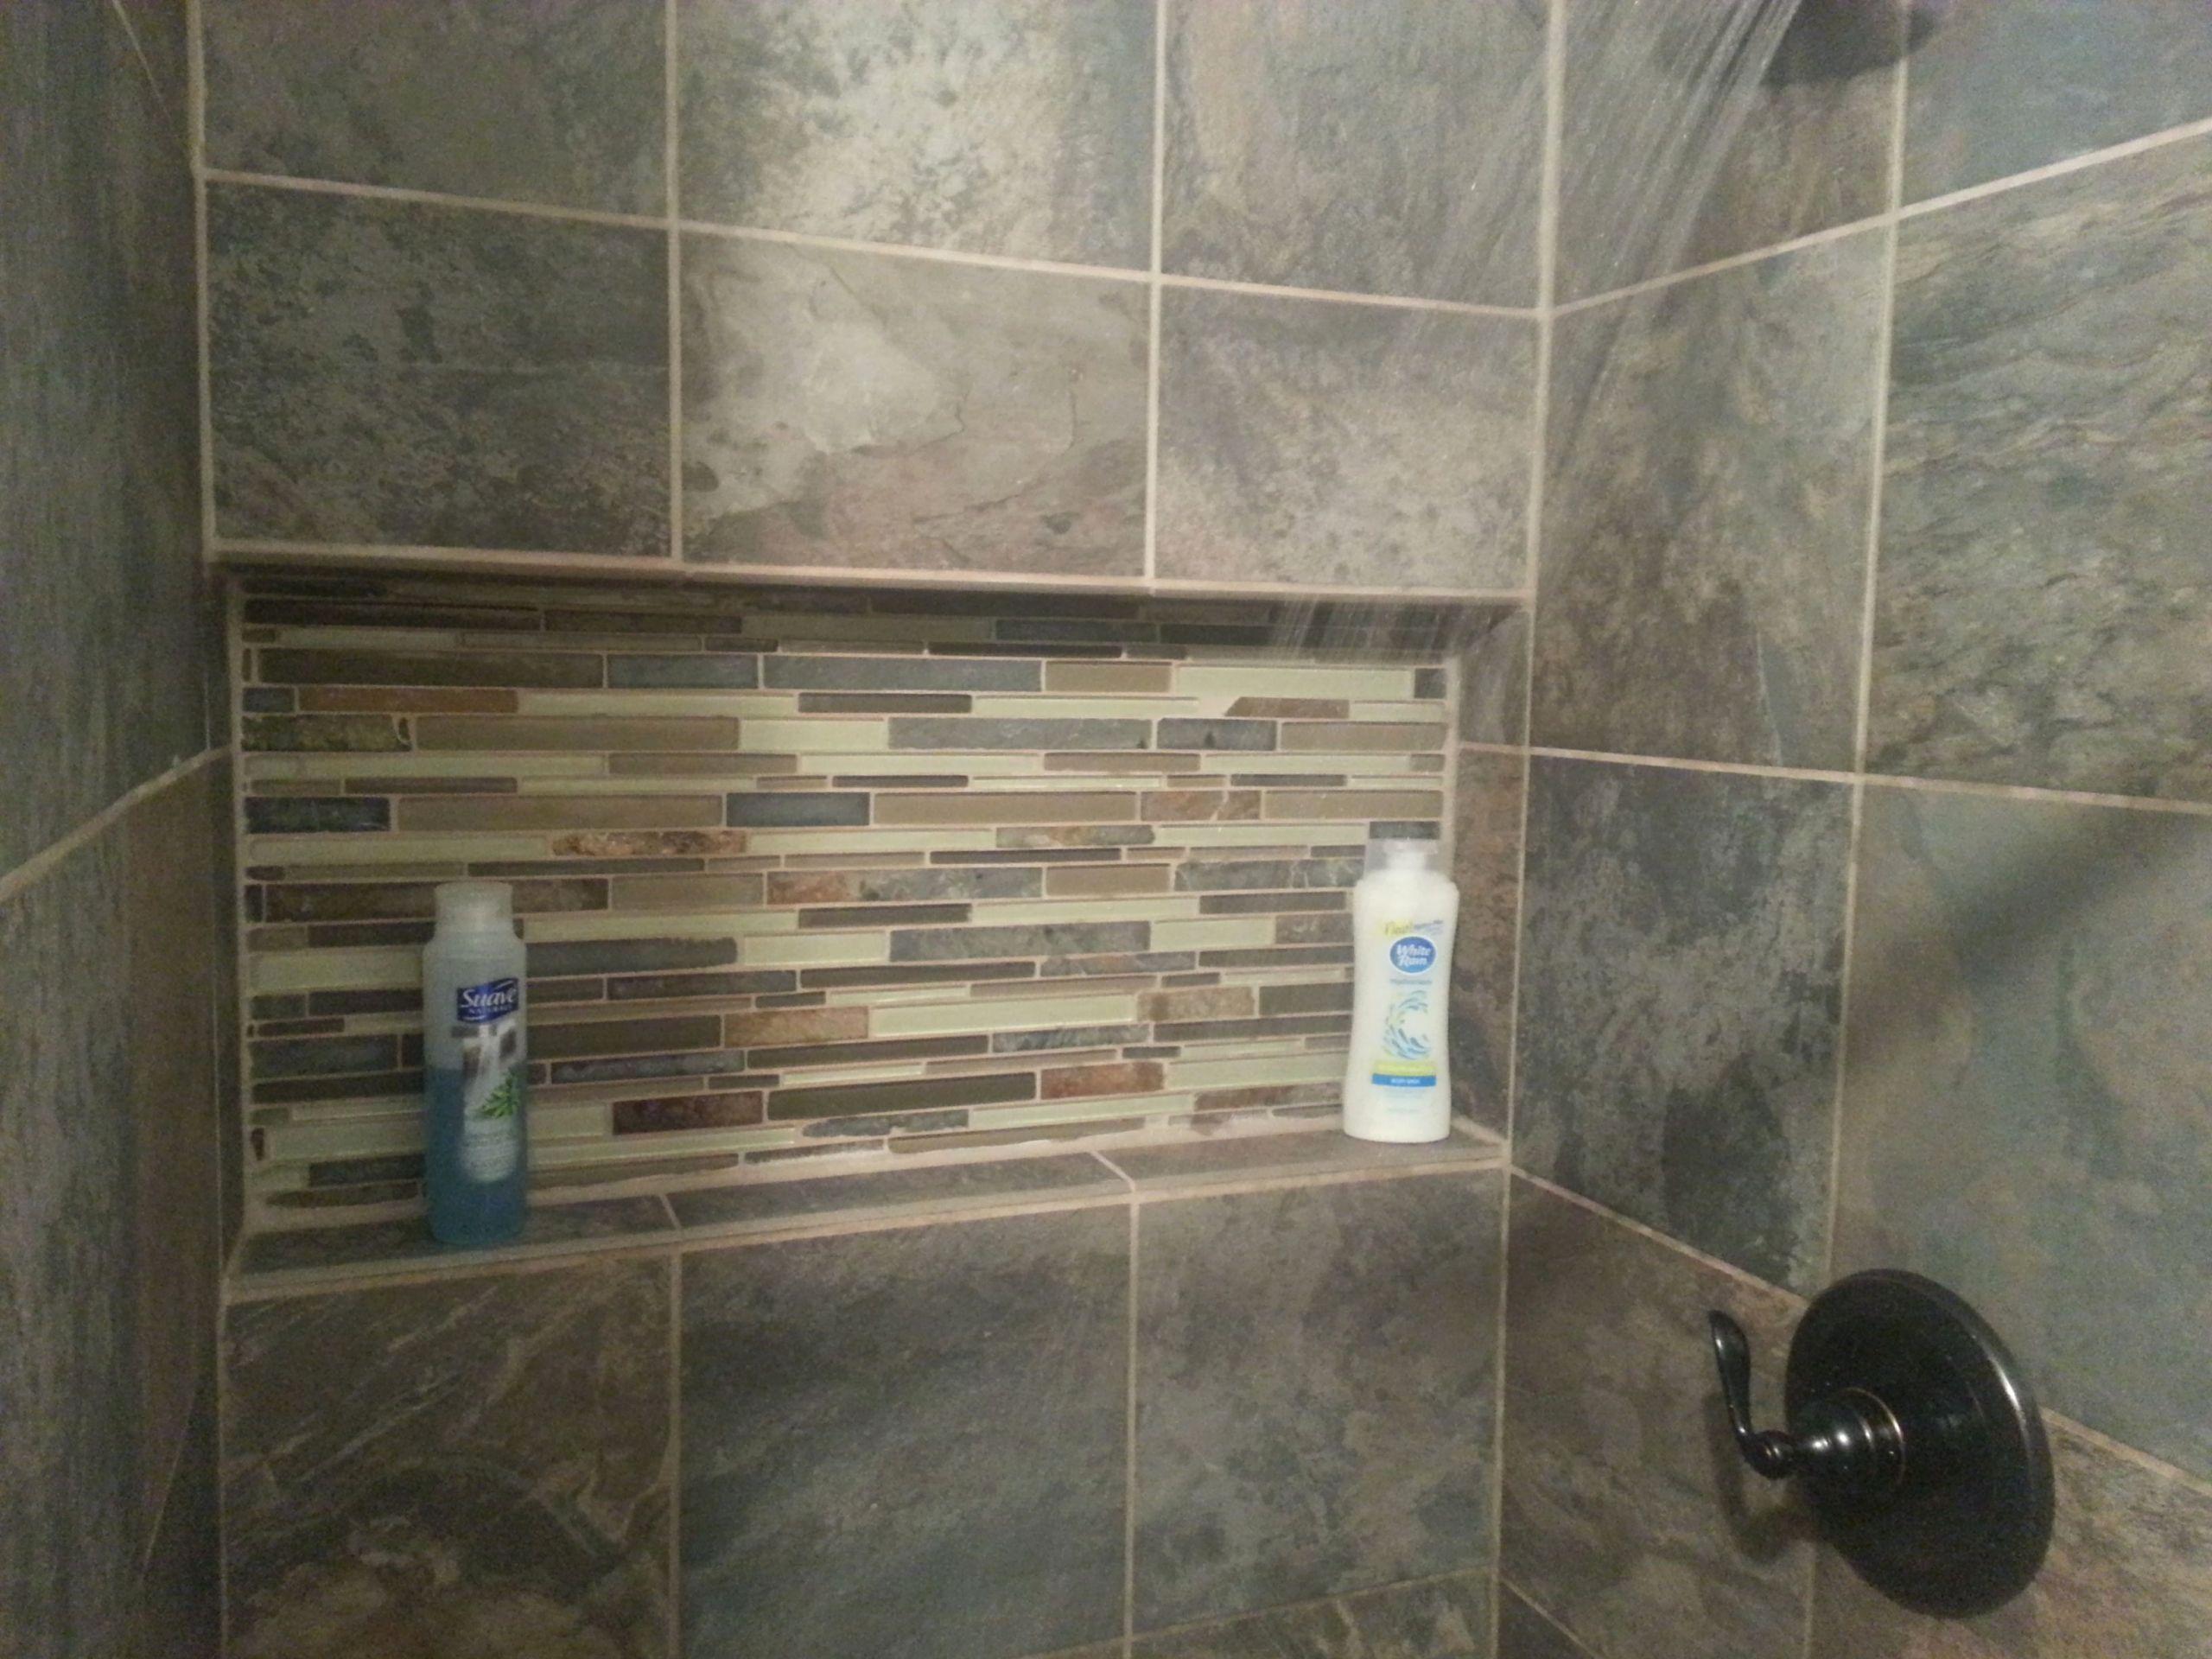 24 Tile Shower Shelf Ideas In 2020 Modern Bathroom Decor